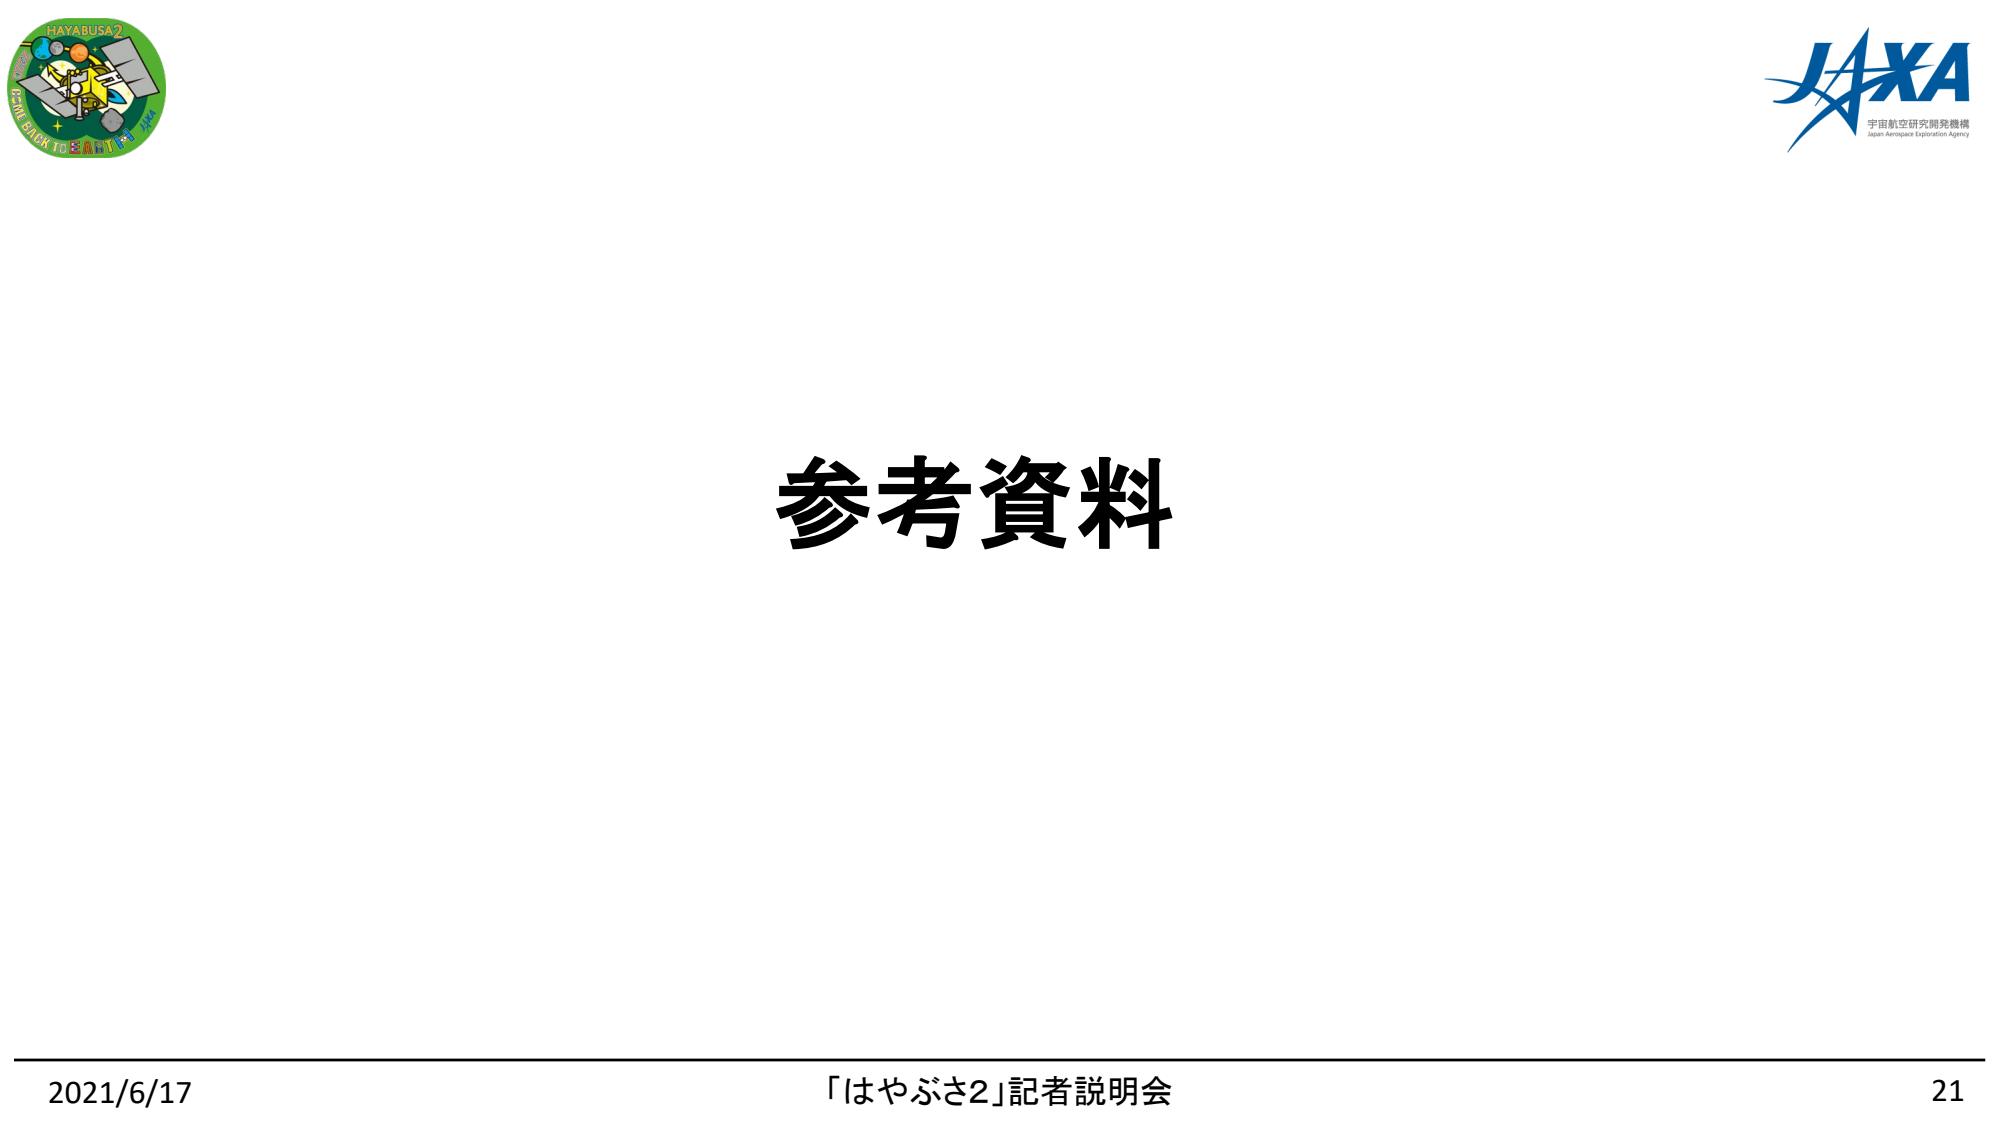 f:id:Imamura:20210617130334p:plain